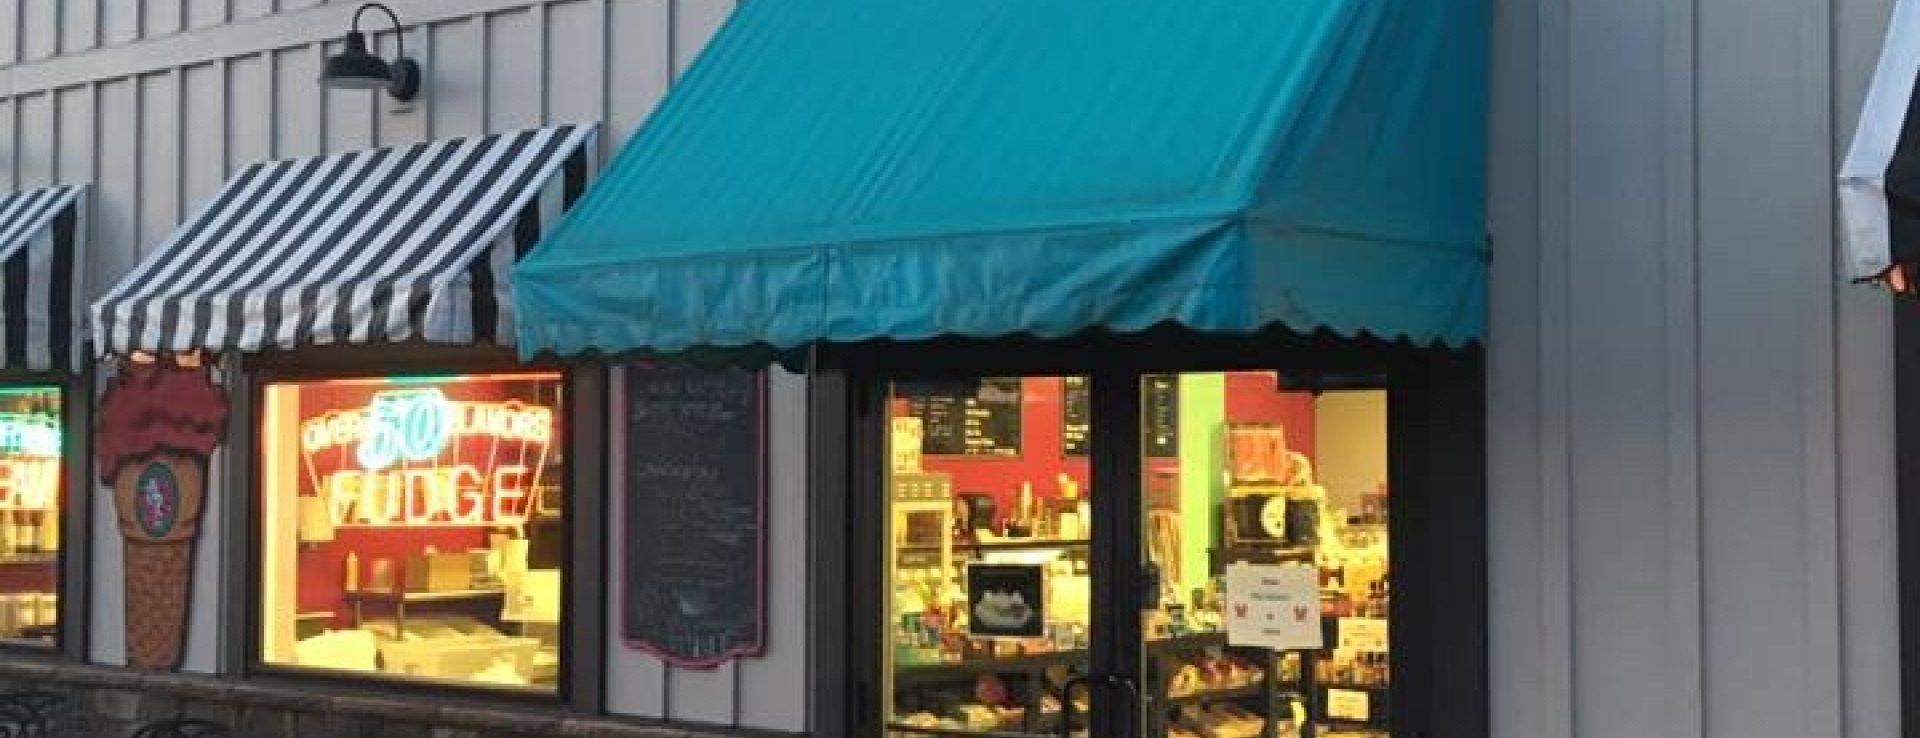 Main Street Fudge Amp Popcorn Co Ohio S Amish Country